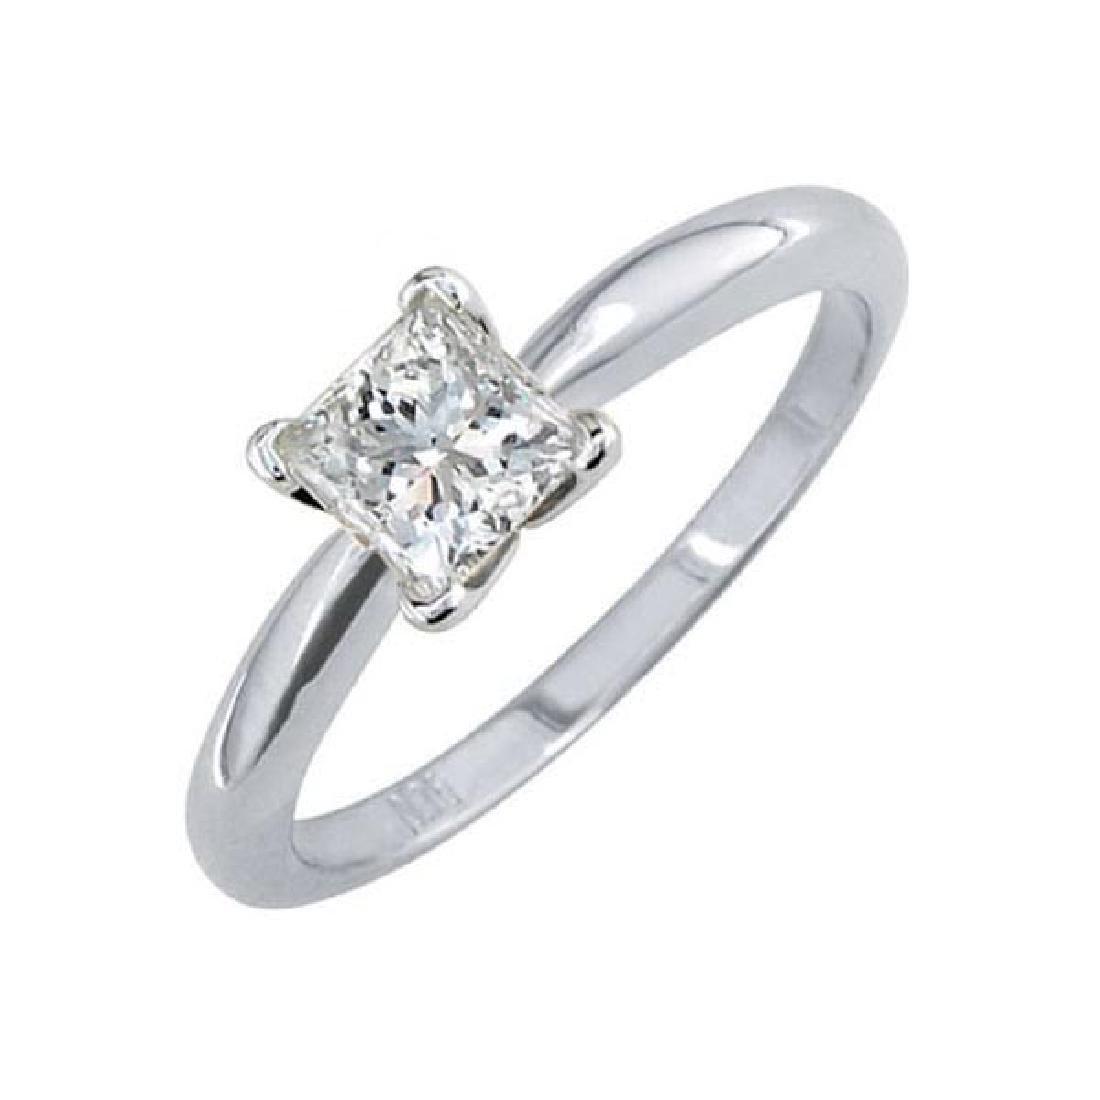 Certified 1.1 CTW Princess Diamond Solitaire 14k Ring G